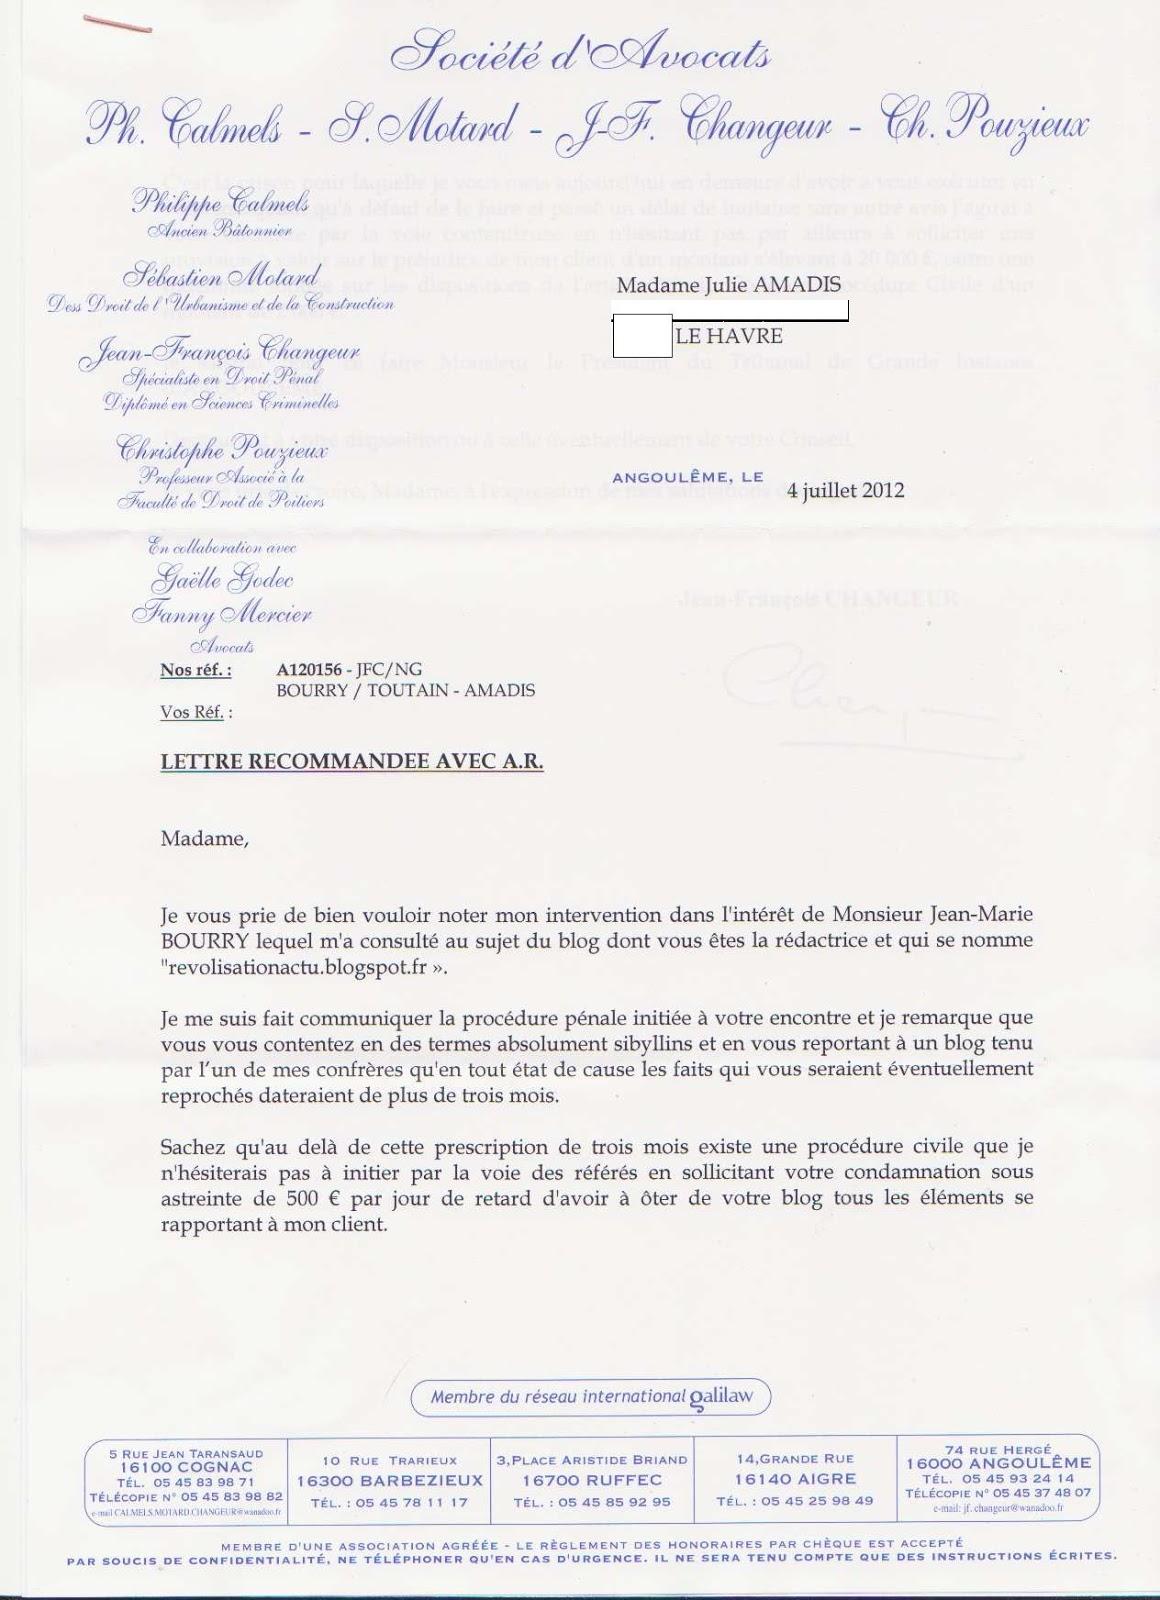 Revolisation Actu Revactu En Juillet Jean Marie Bourry Cote D